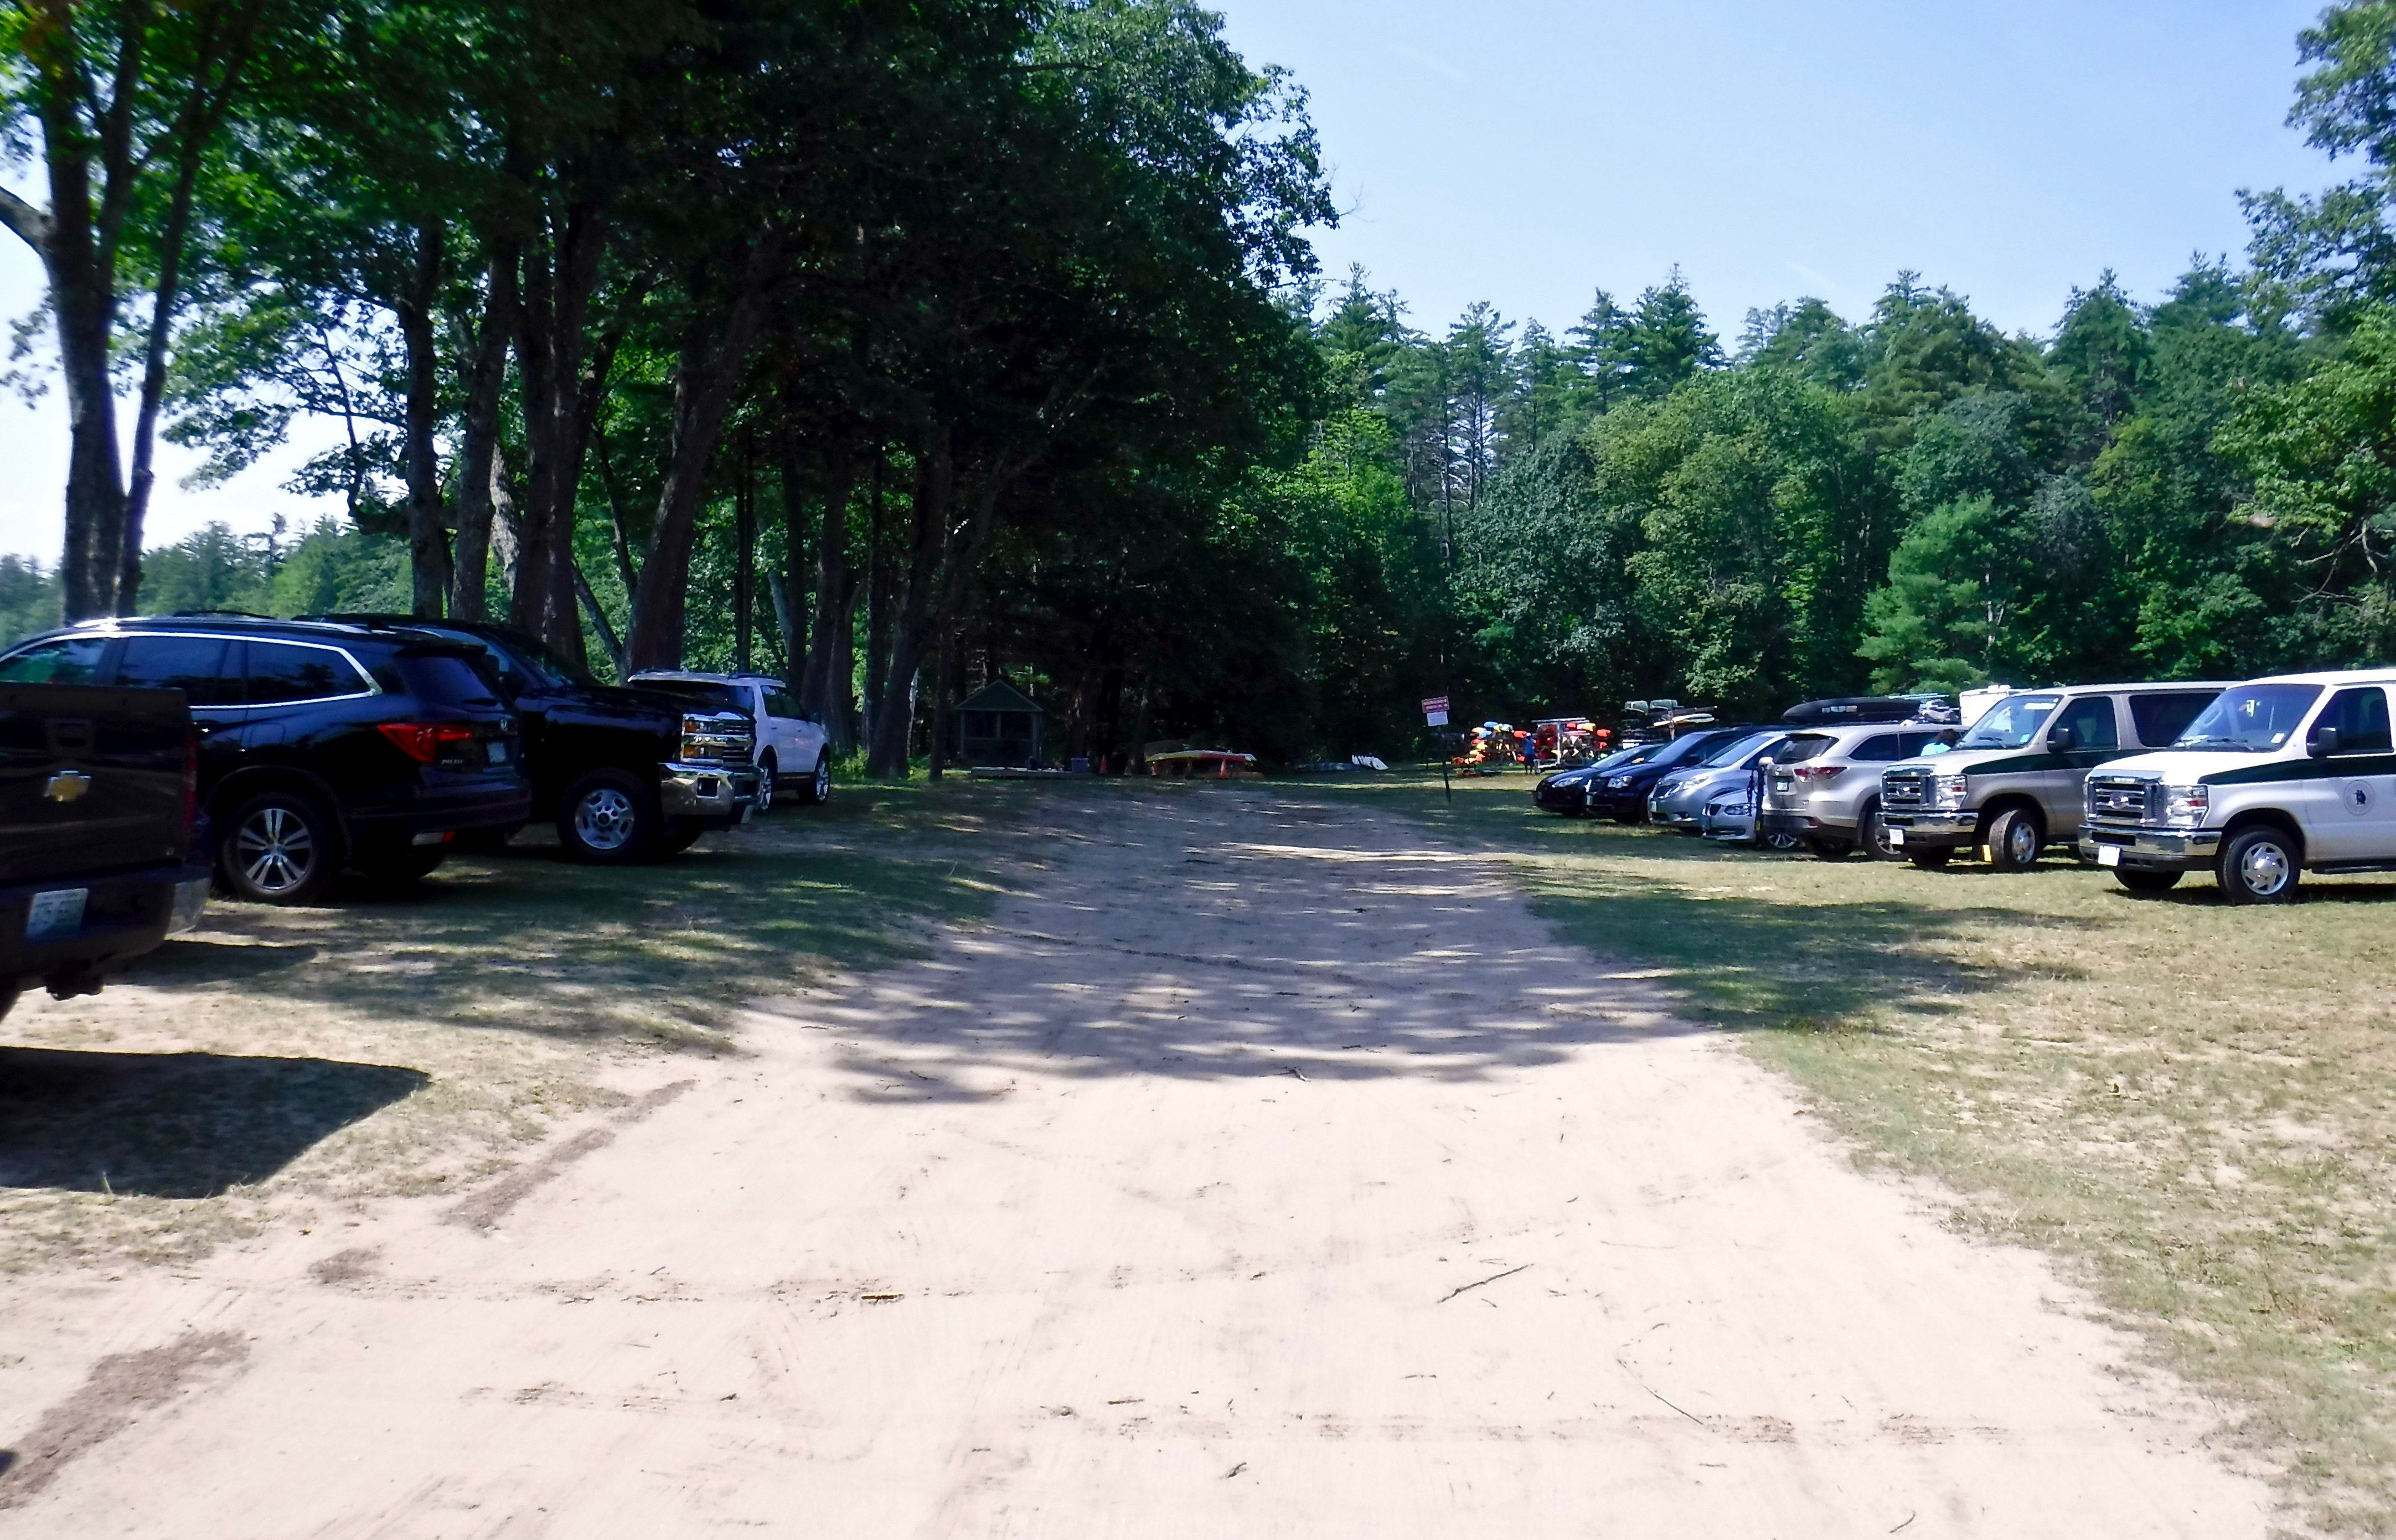 kayaking-contoocook-river-contoocook-canoe-company-parking-area